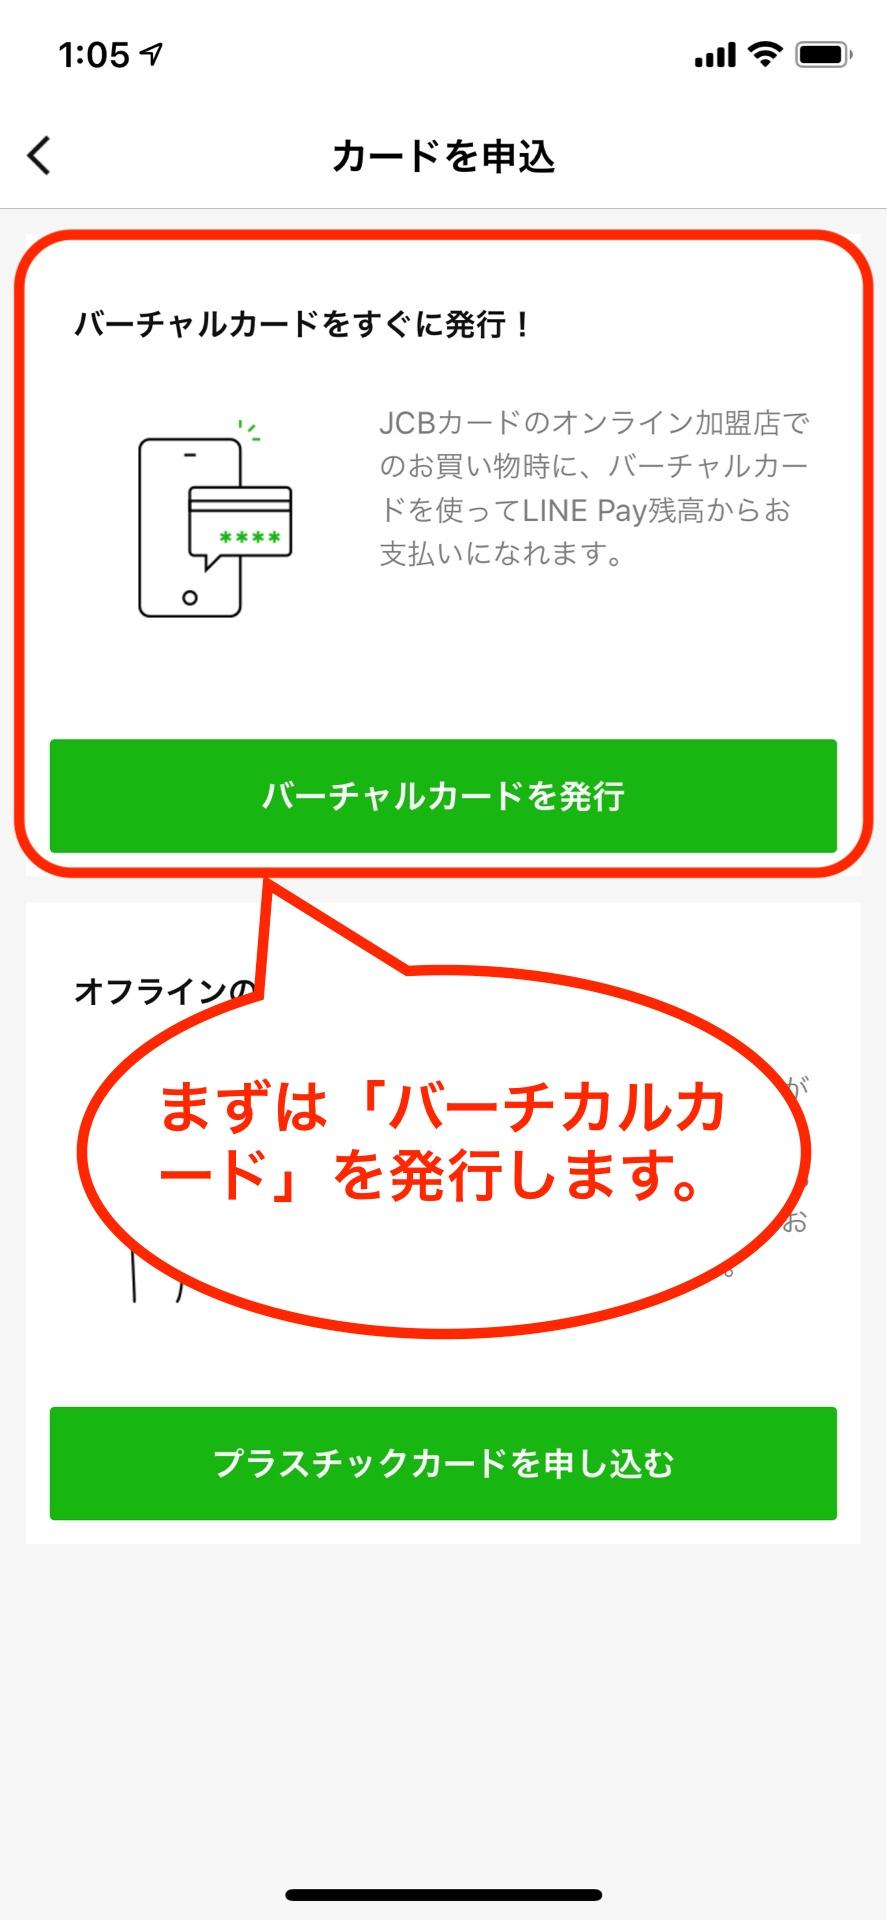 LINEPayカード発行手順3